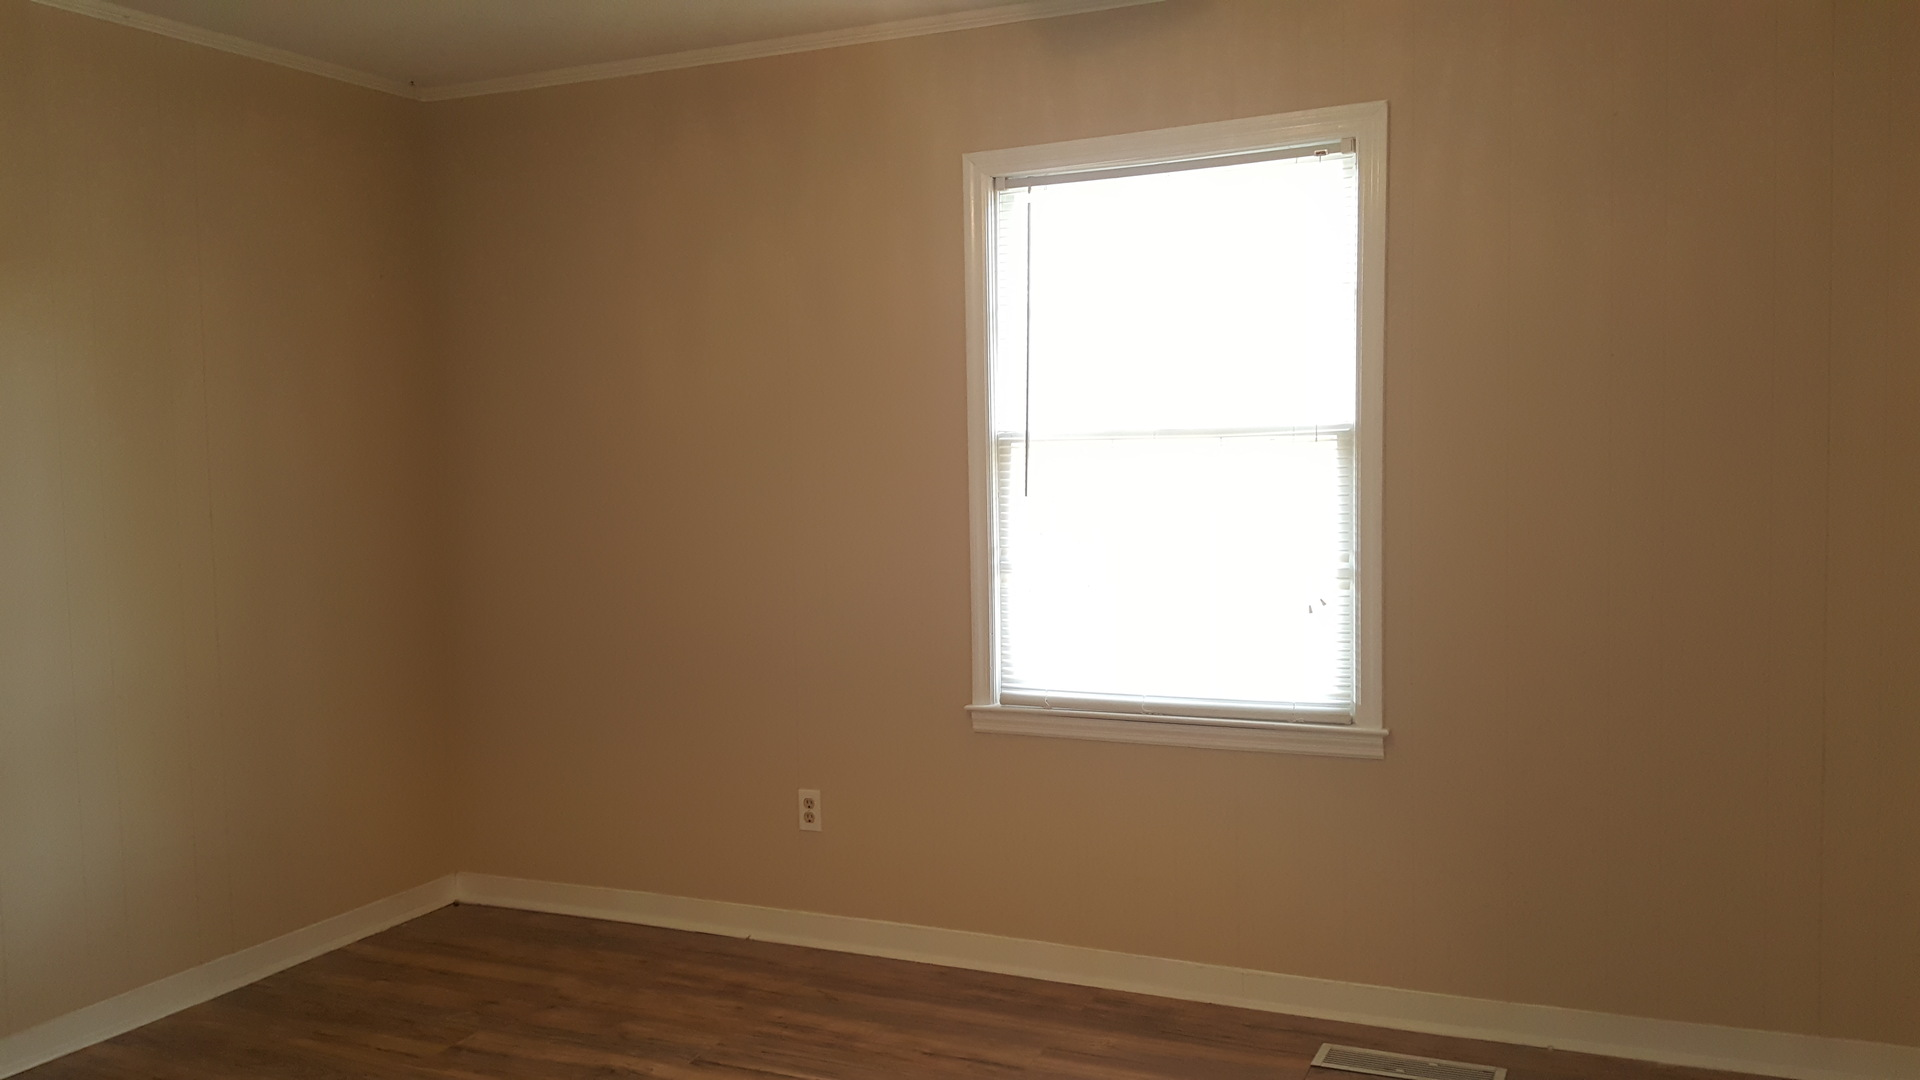 2 Bedroom Townhome W/ Wood Floors Golf Group